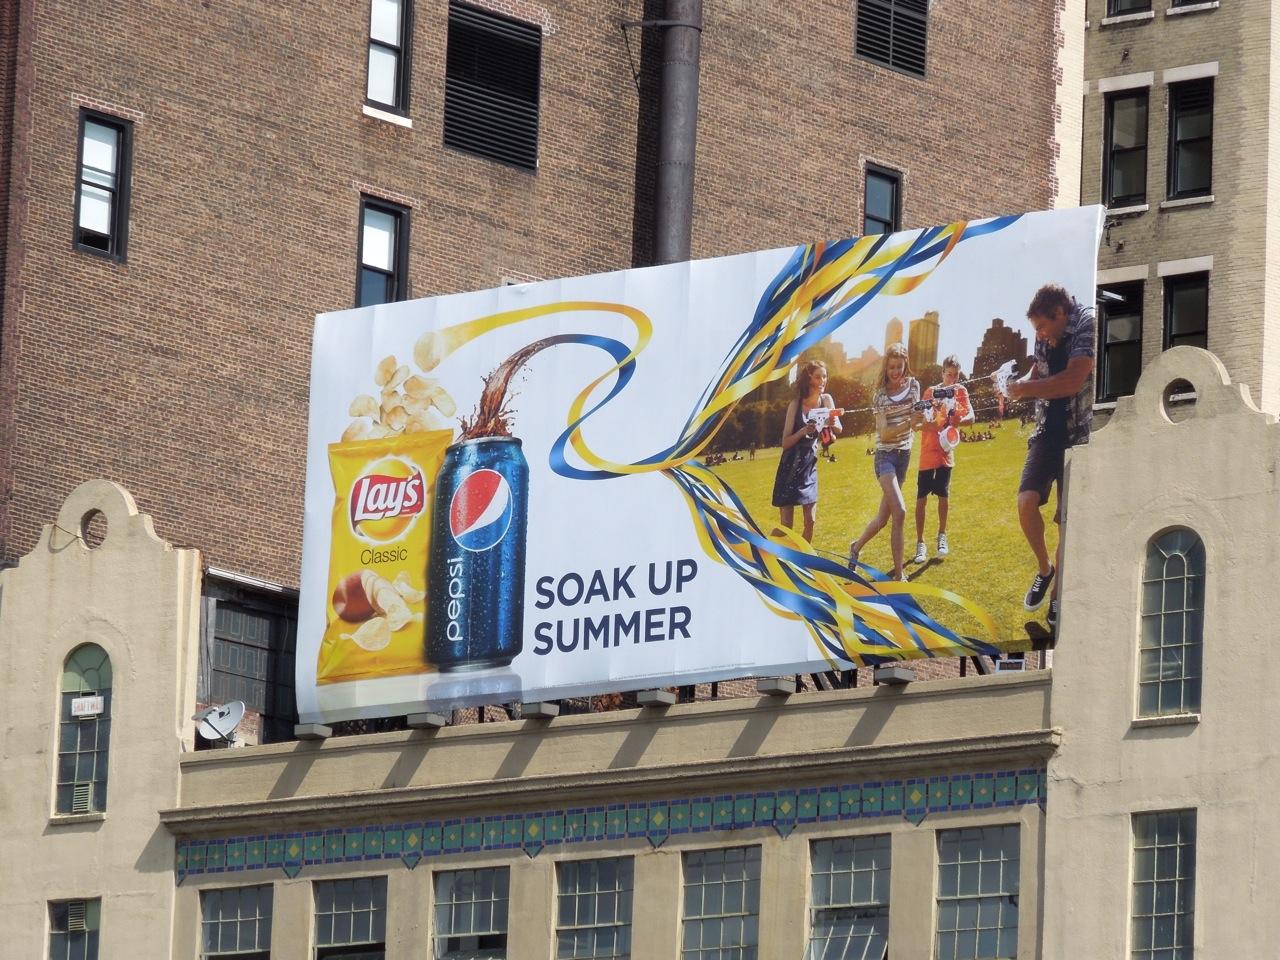 Lays Pepsi Soak up Summer billboard